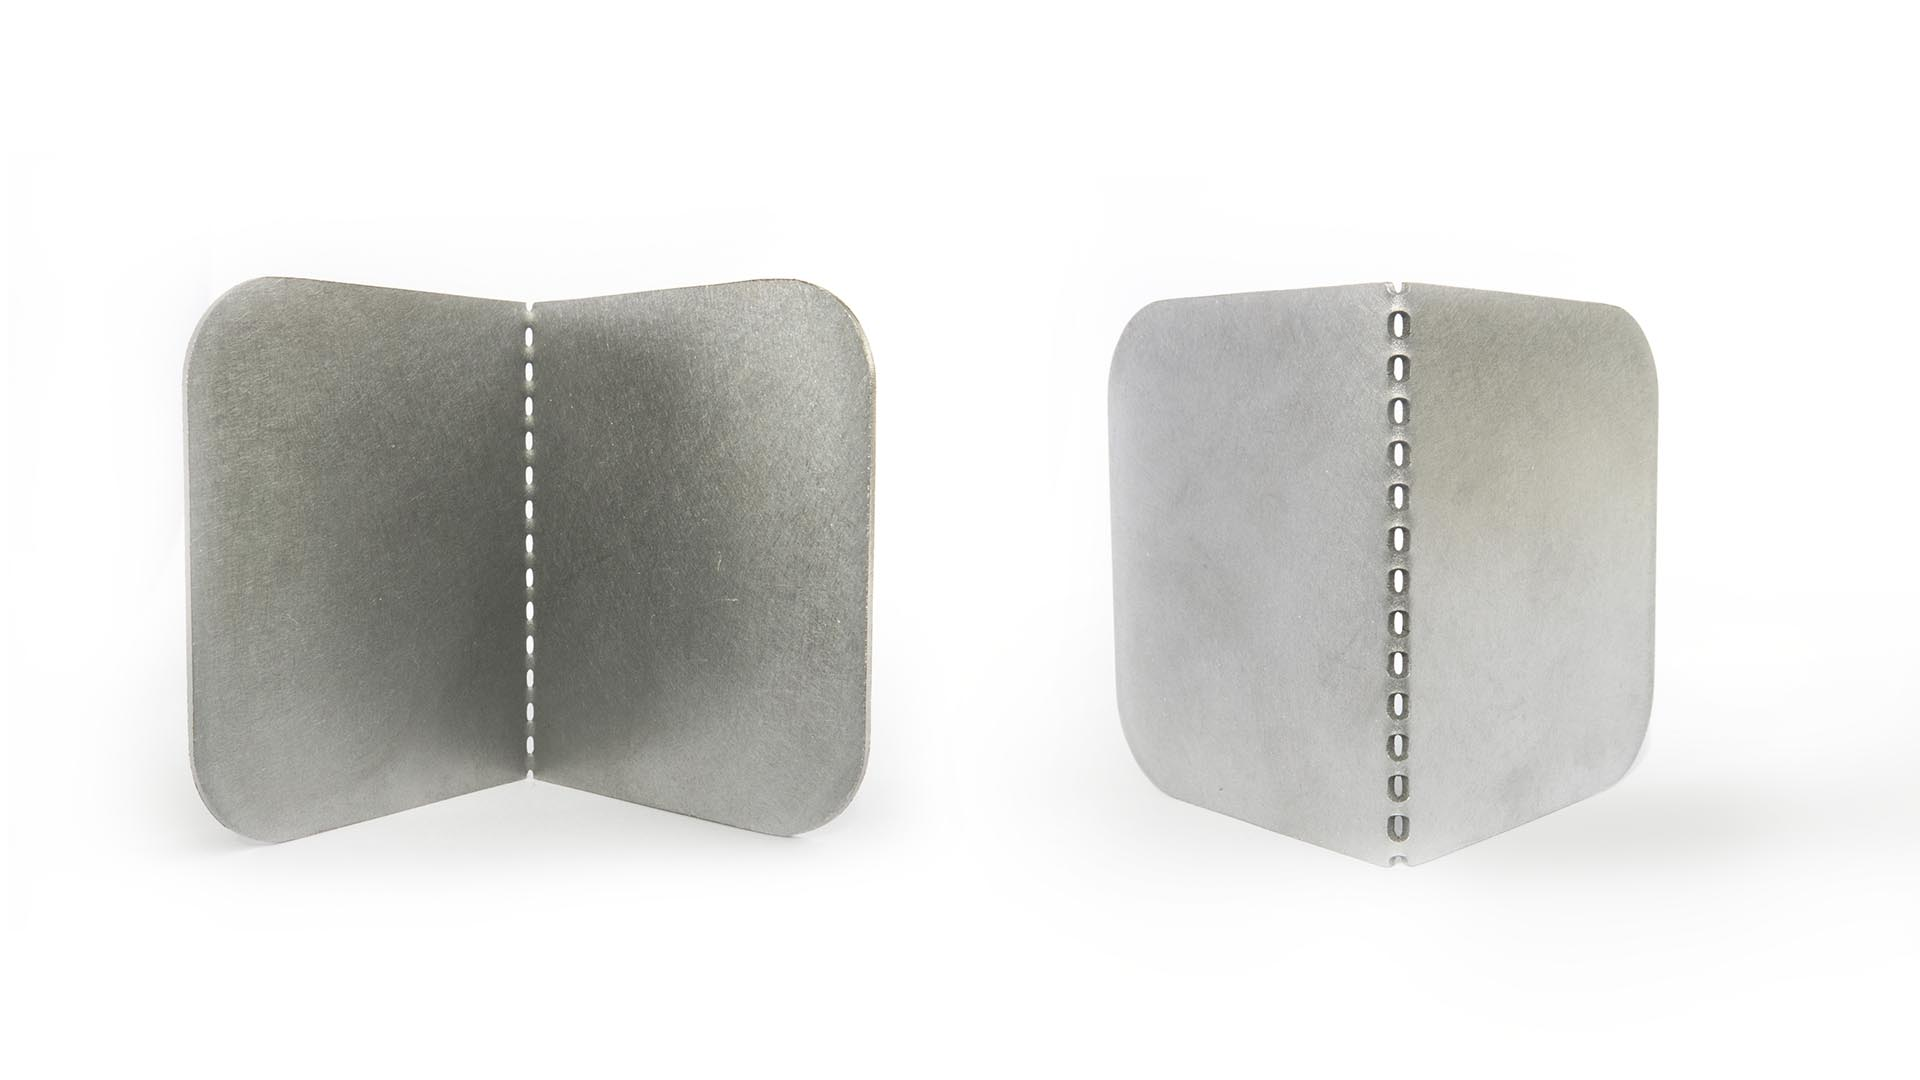 Inside / outside comparison of the folded metal laser cut part